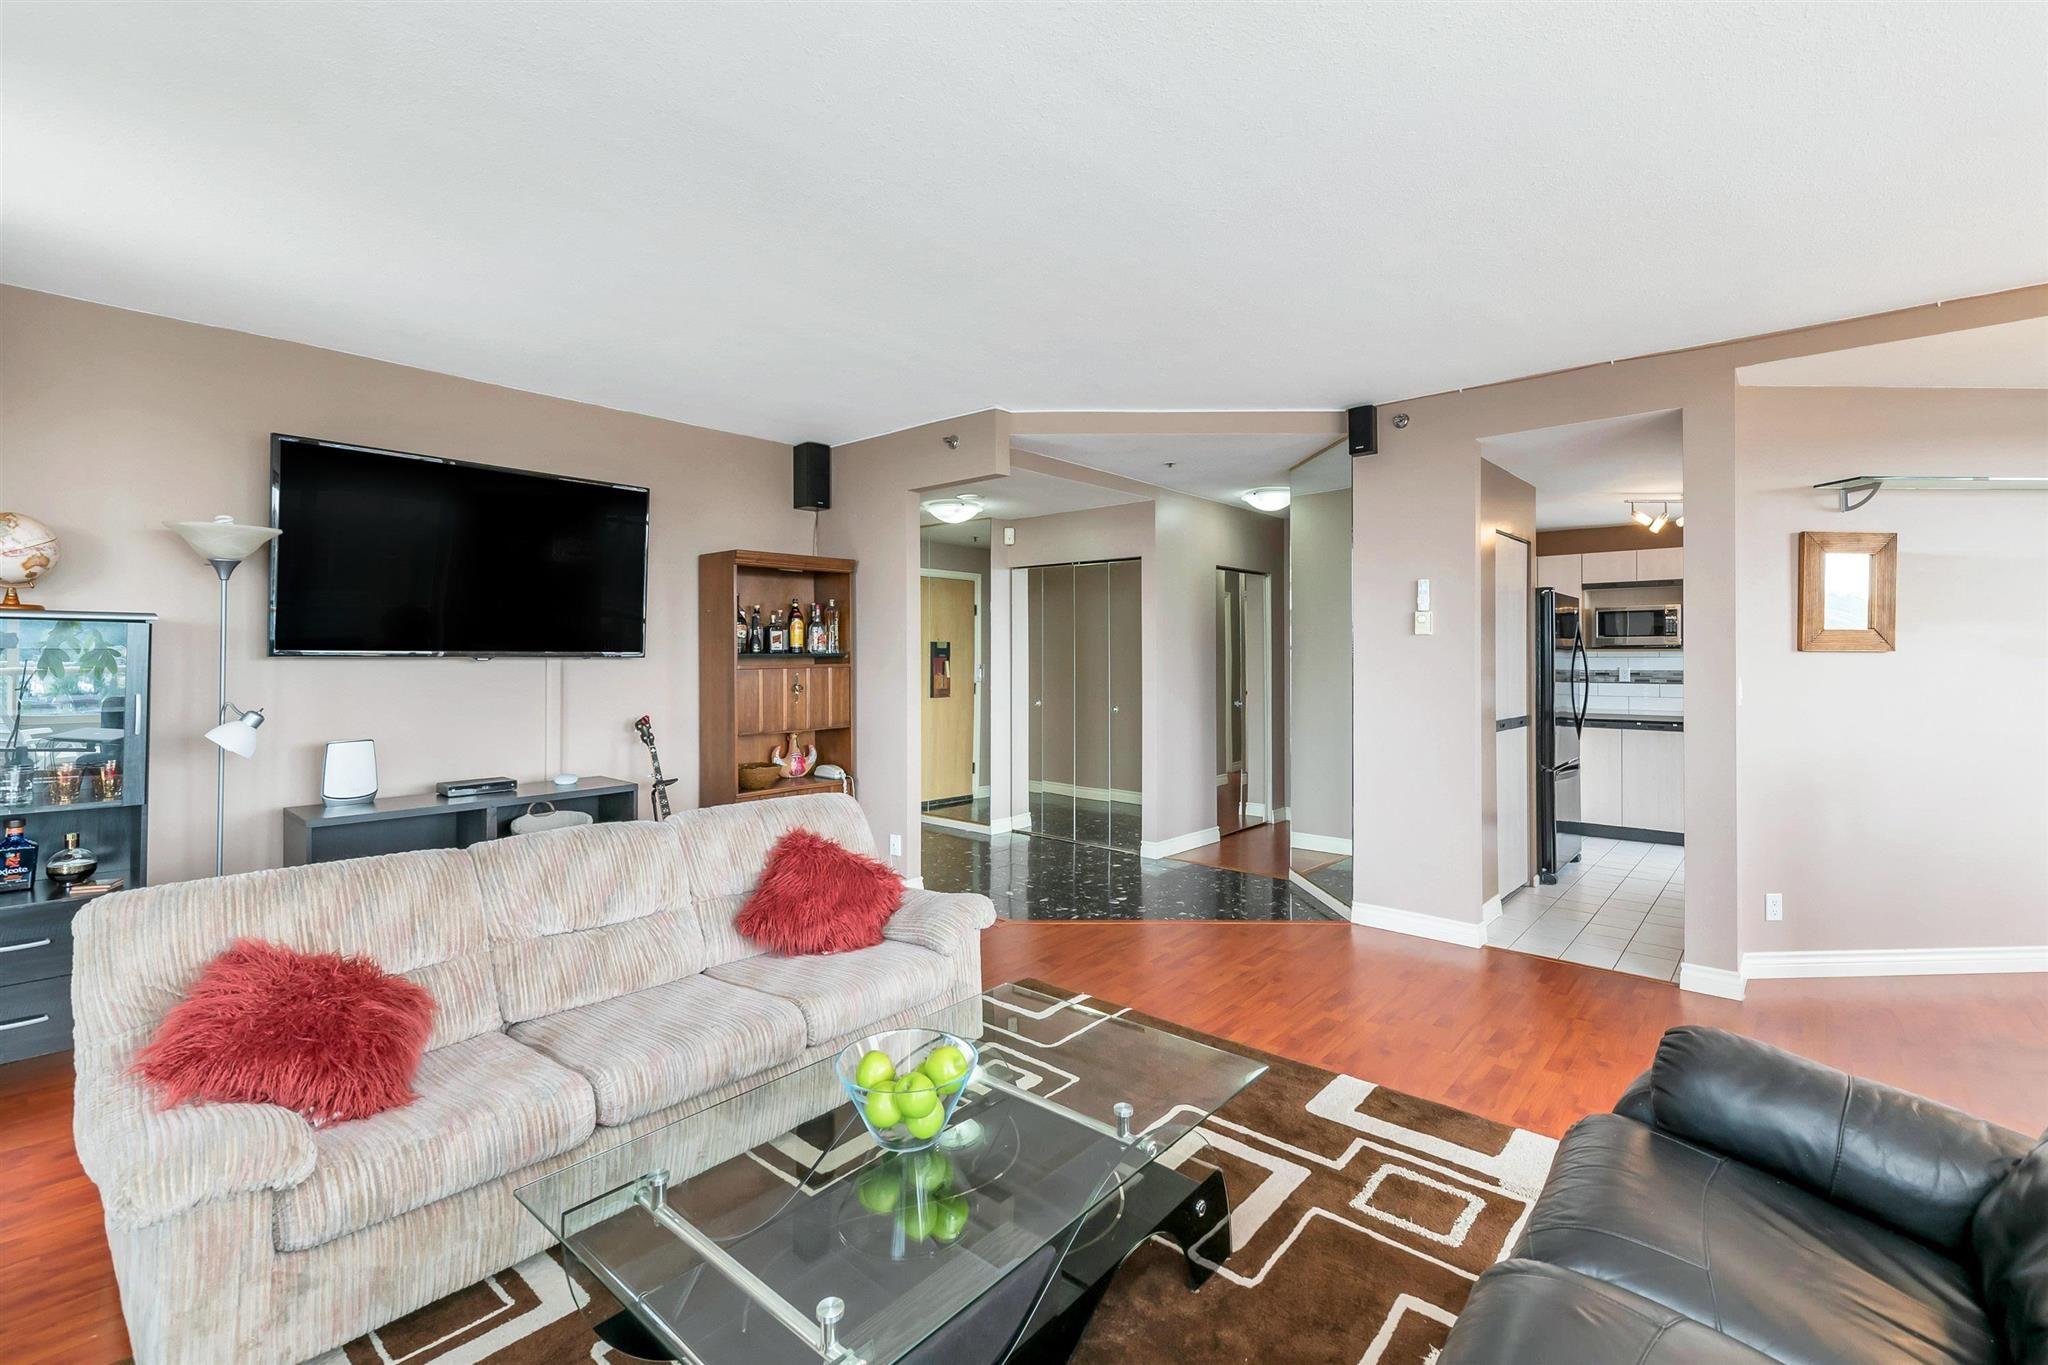 "Photo 5: Photos: 1401 728 FARROW Street in Coquitlam: Coquitlam West Condo for sale in ""THE VICTORIA"" : MLS®# R2615321"